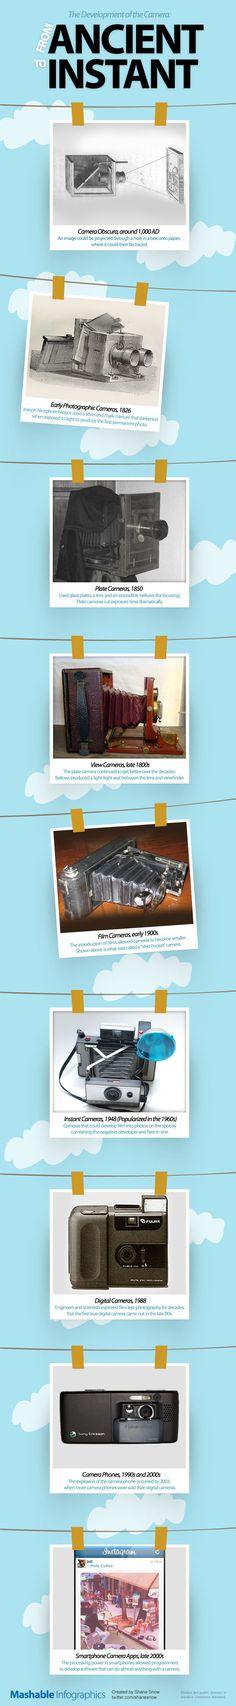 Historia de las cámaras fotográficas instantáneas #infografia #infographic